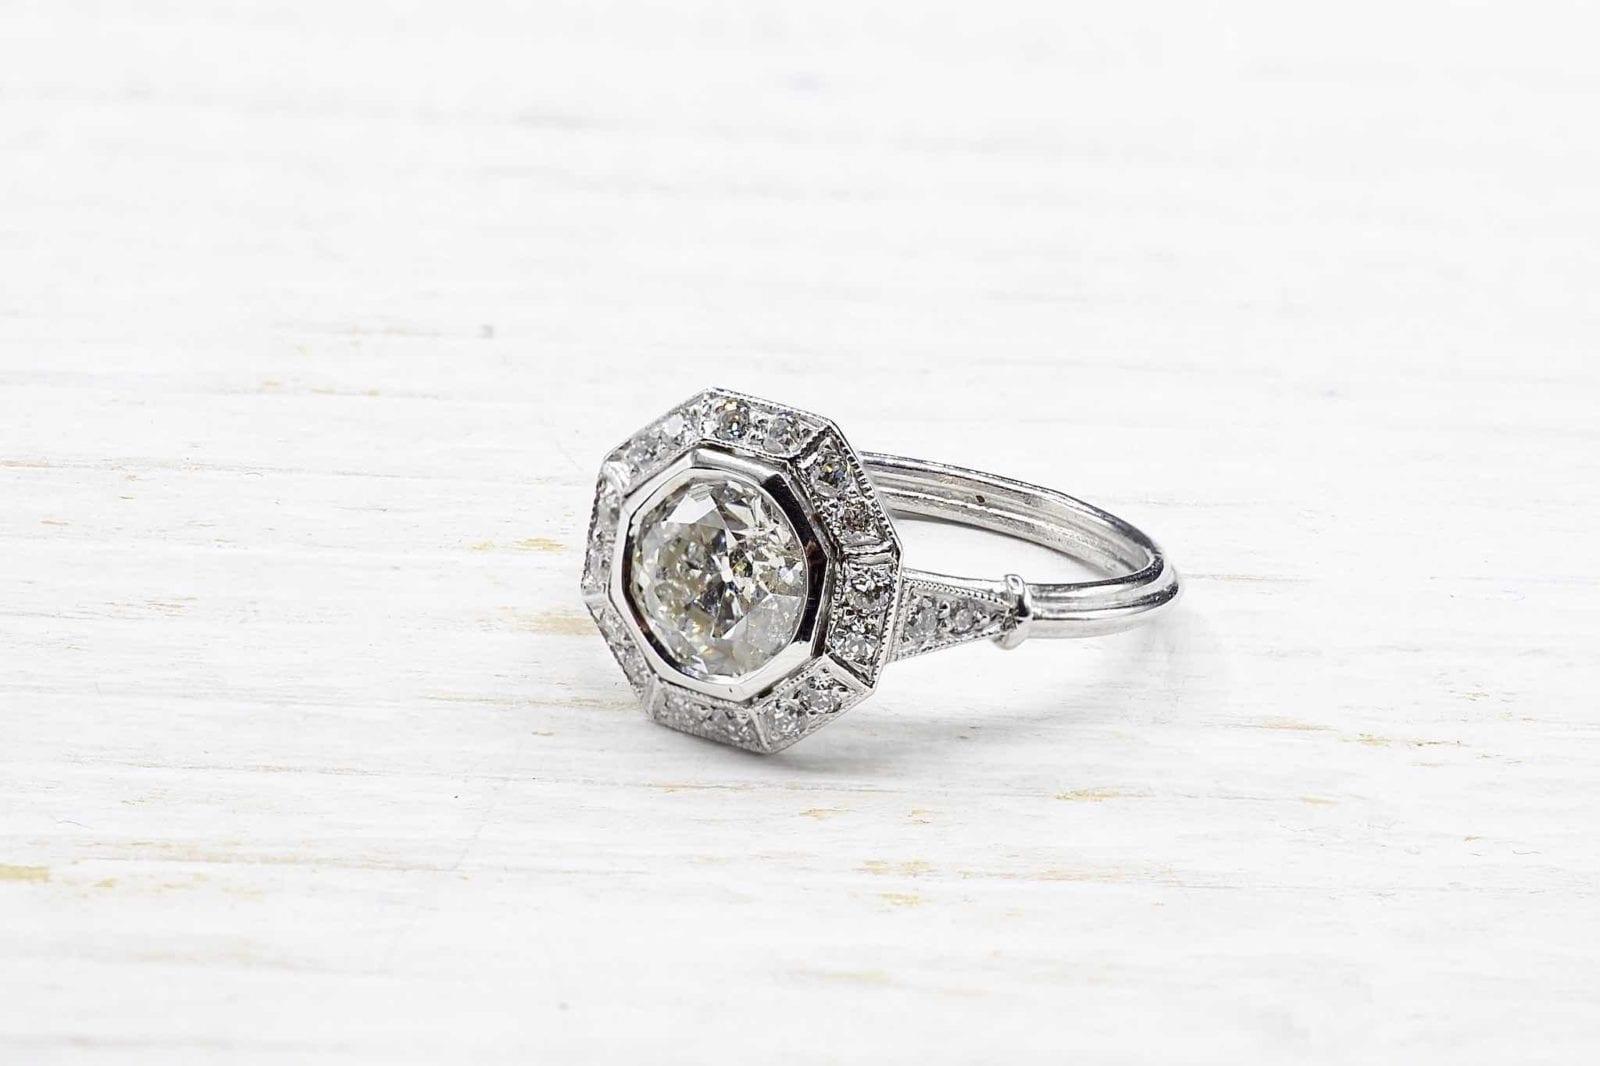 Bague diamants platine vintage